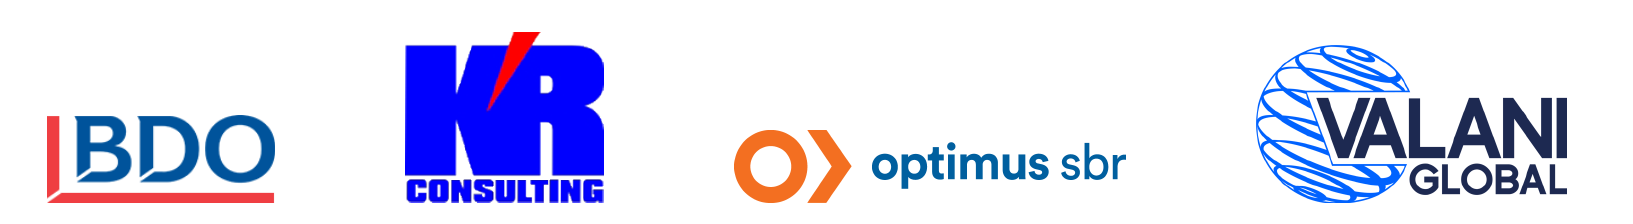 ifrs-17-logos-valani-global